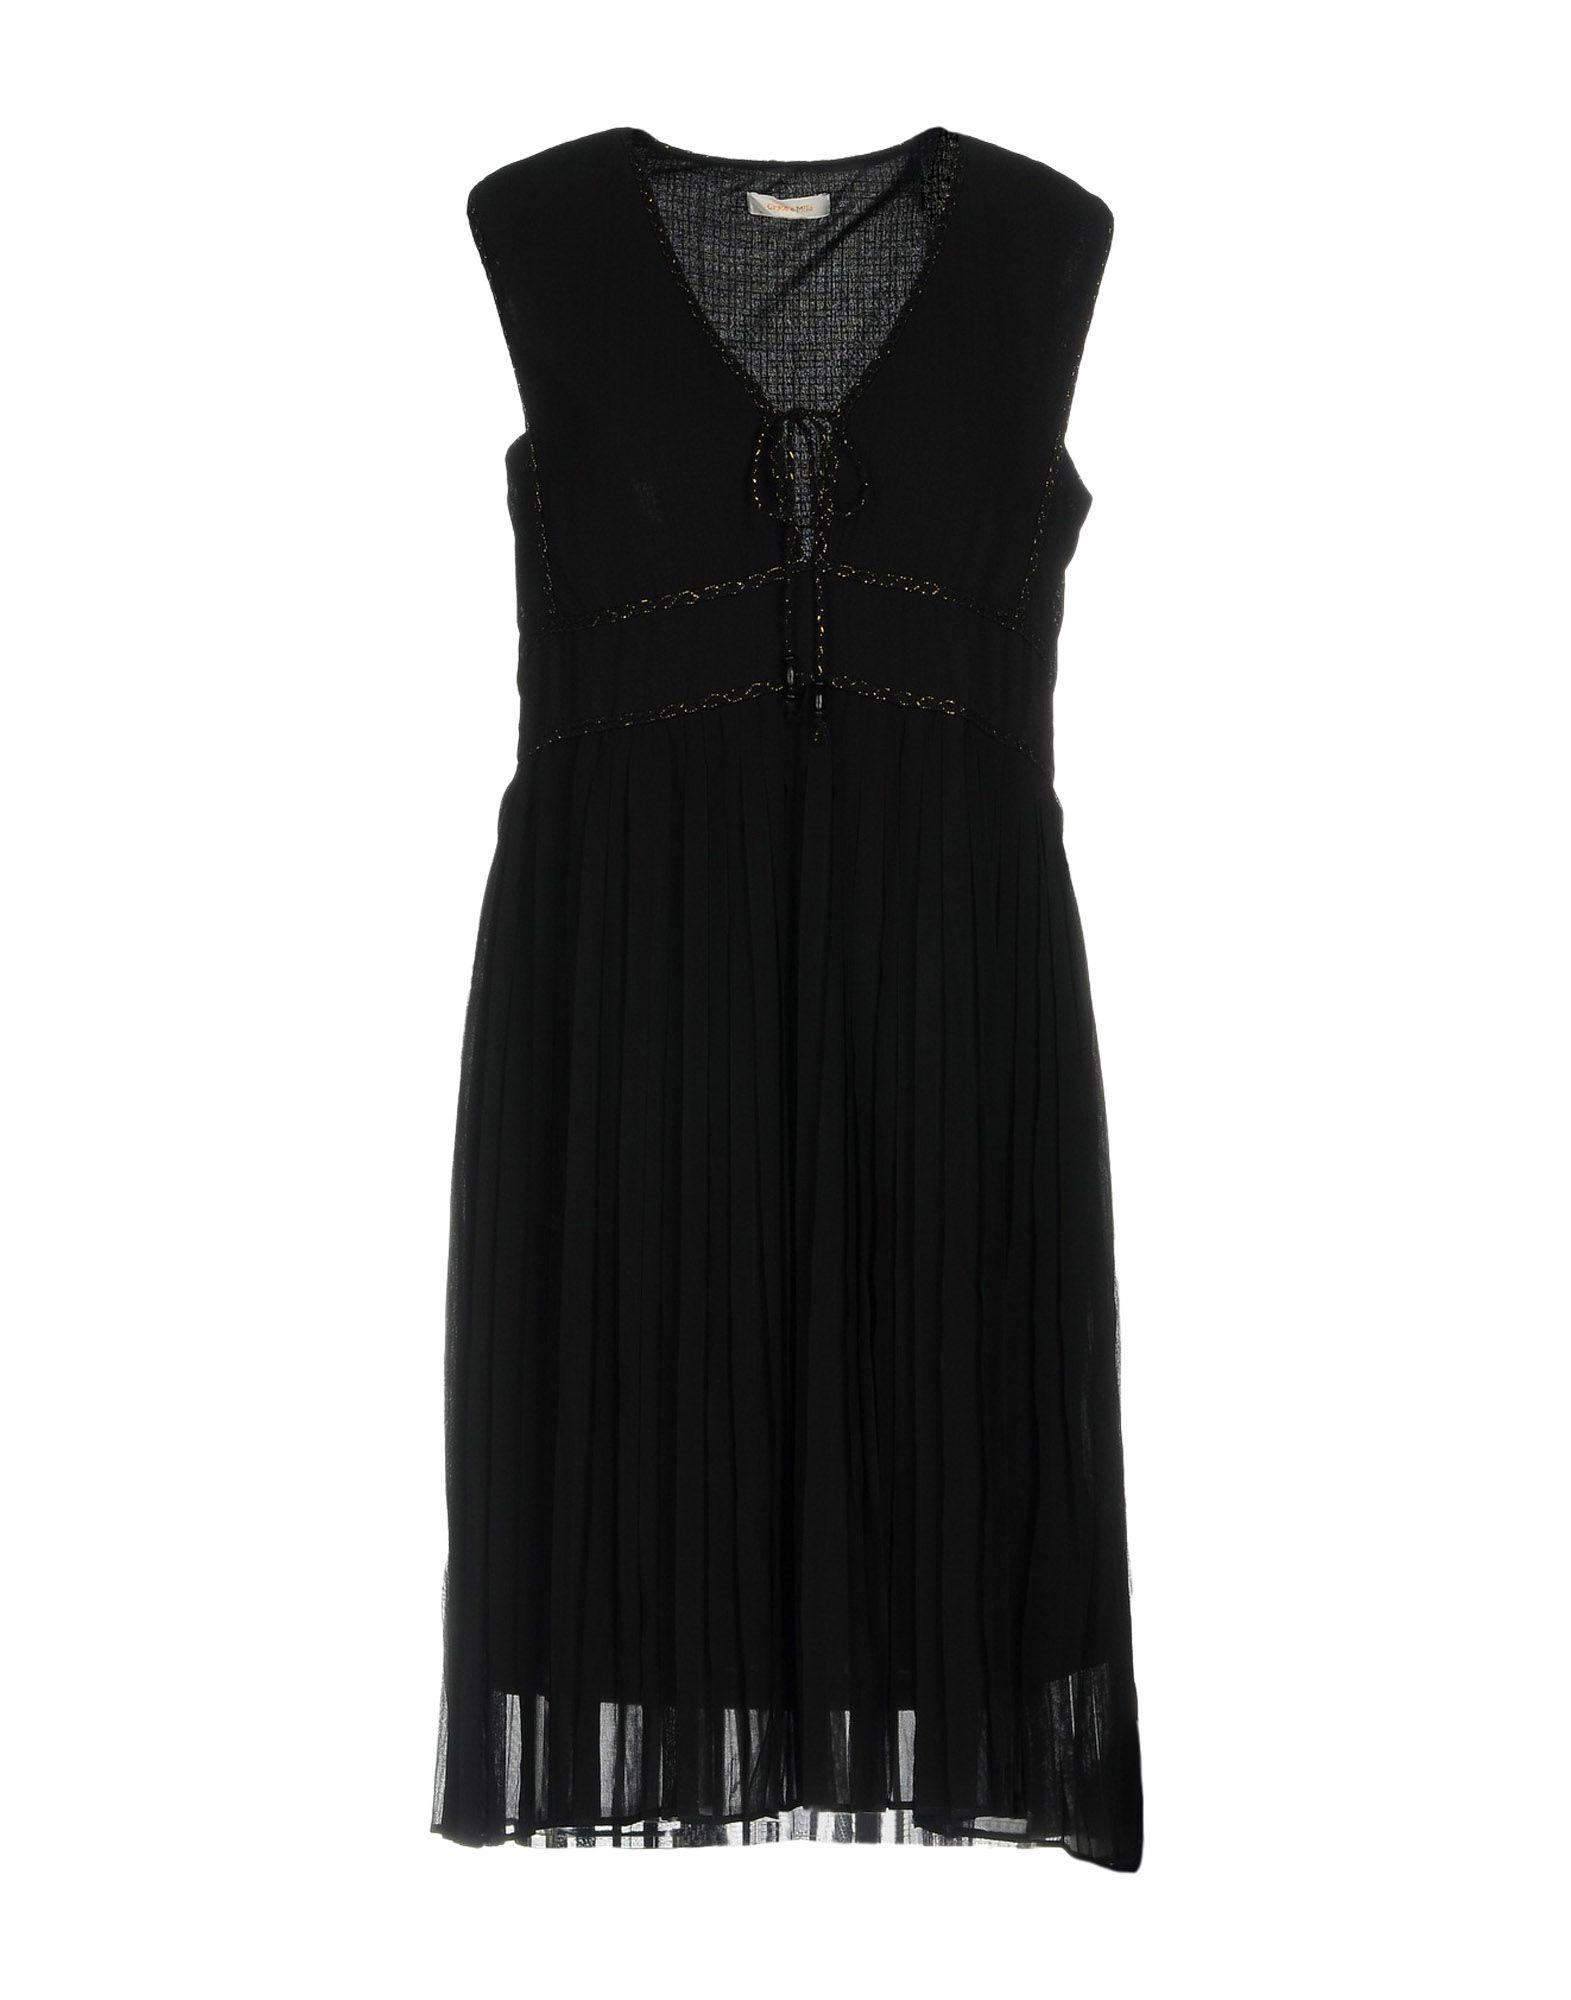 SELECTED FEMME Короткое платье водолазка selected femme selected femme se781ewuxz35